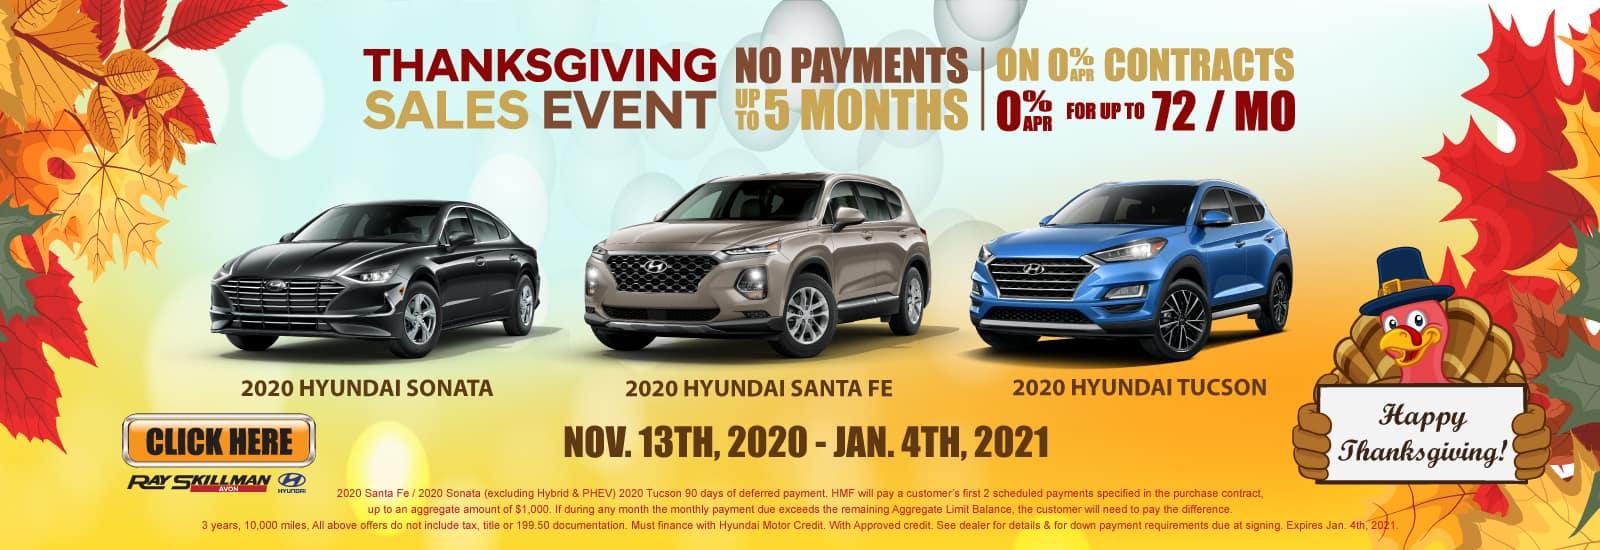 2020-Hyundai-Sonata-Tucson-Santa-Fe-Thanksgiving-Promo-Web-Banner-1600×550